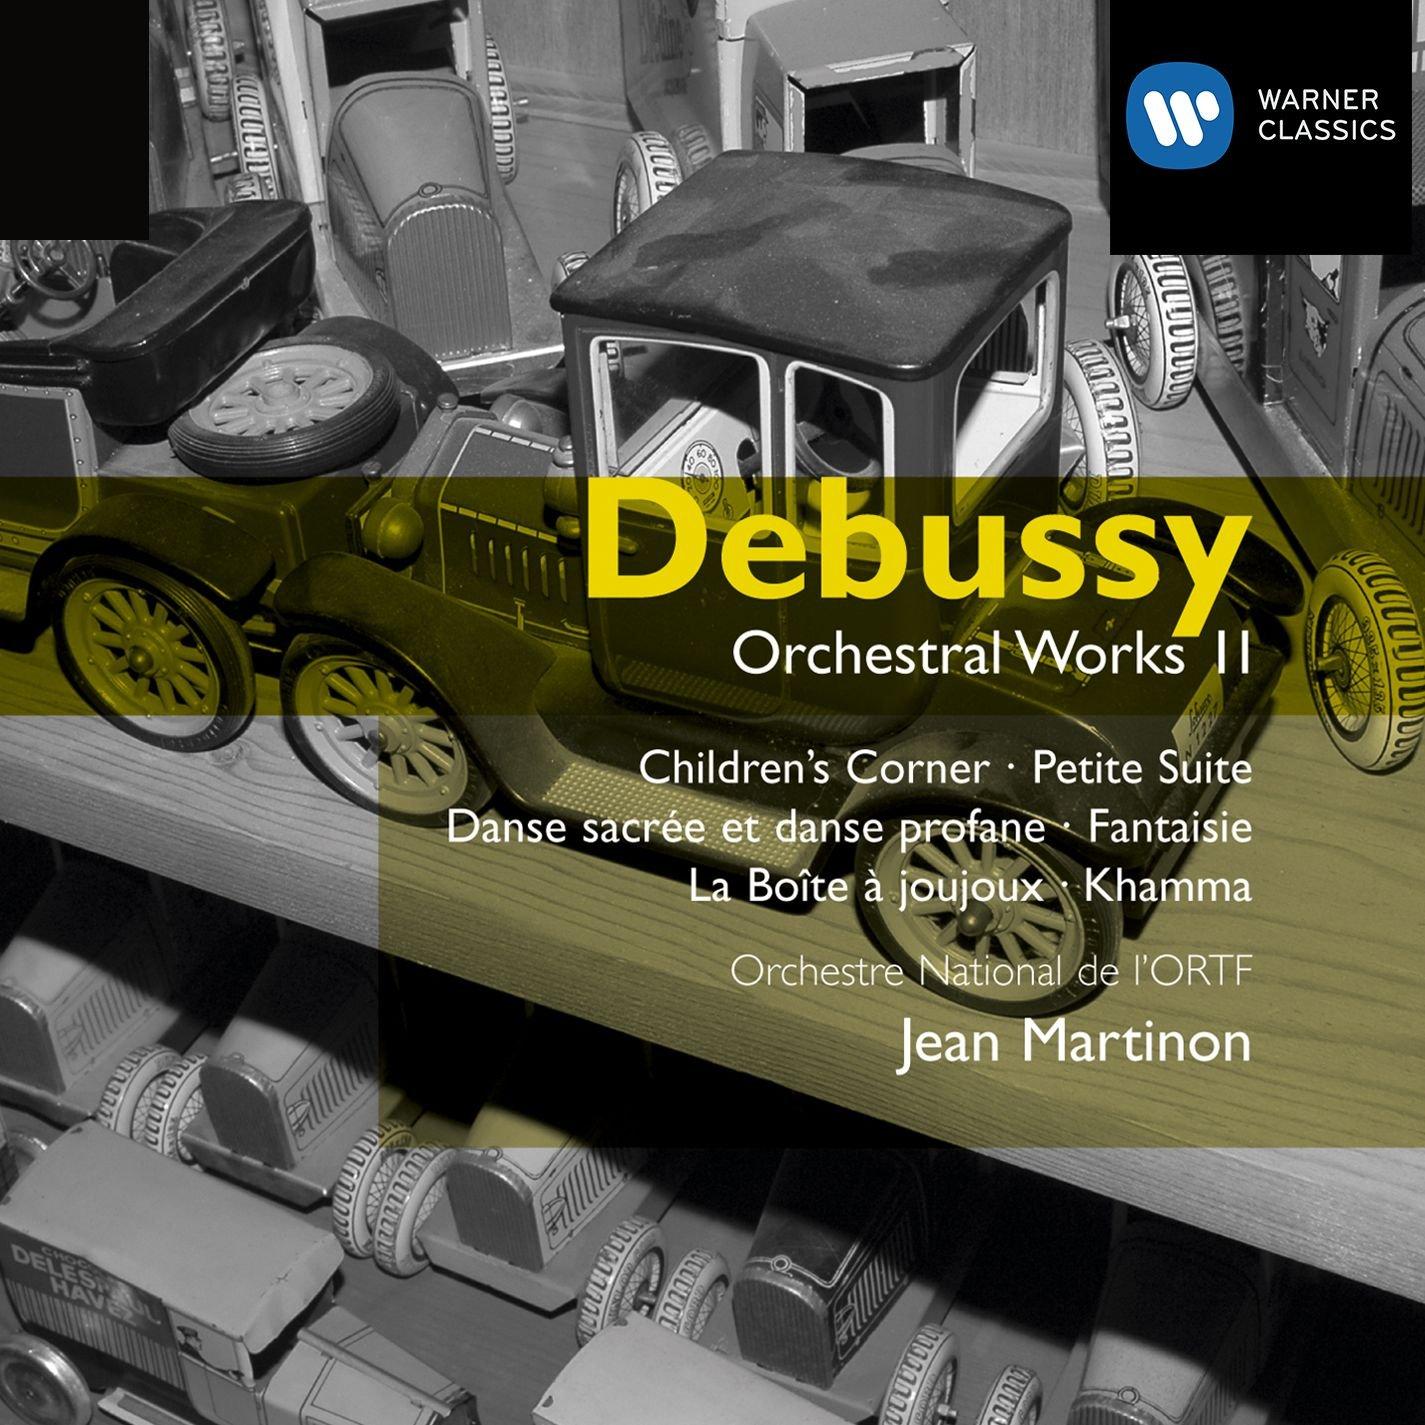 Debussy: Orchestral Works II by Warner Classics / EMI Classics